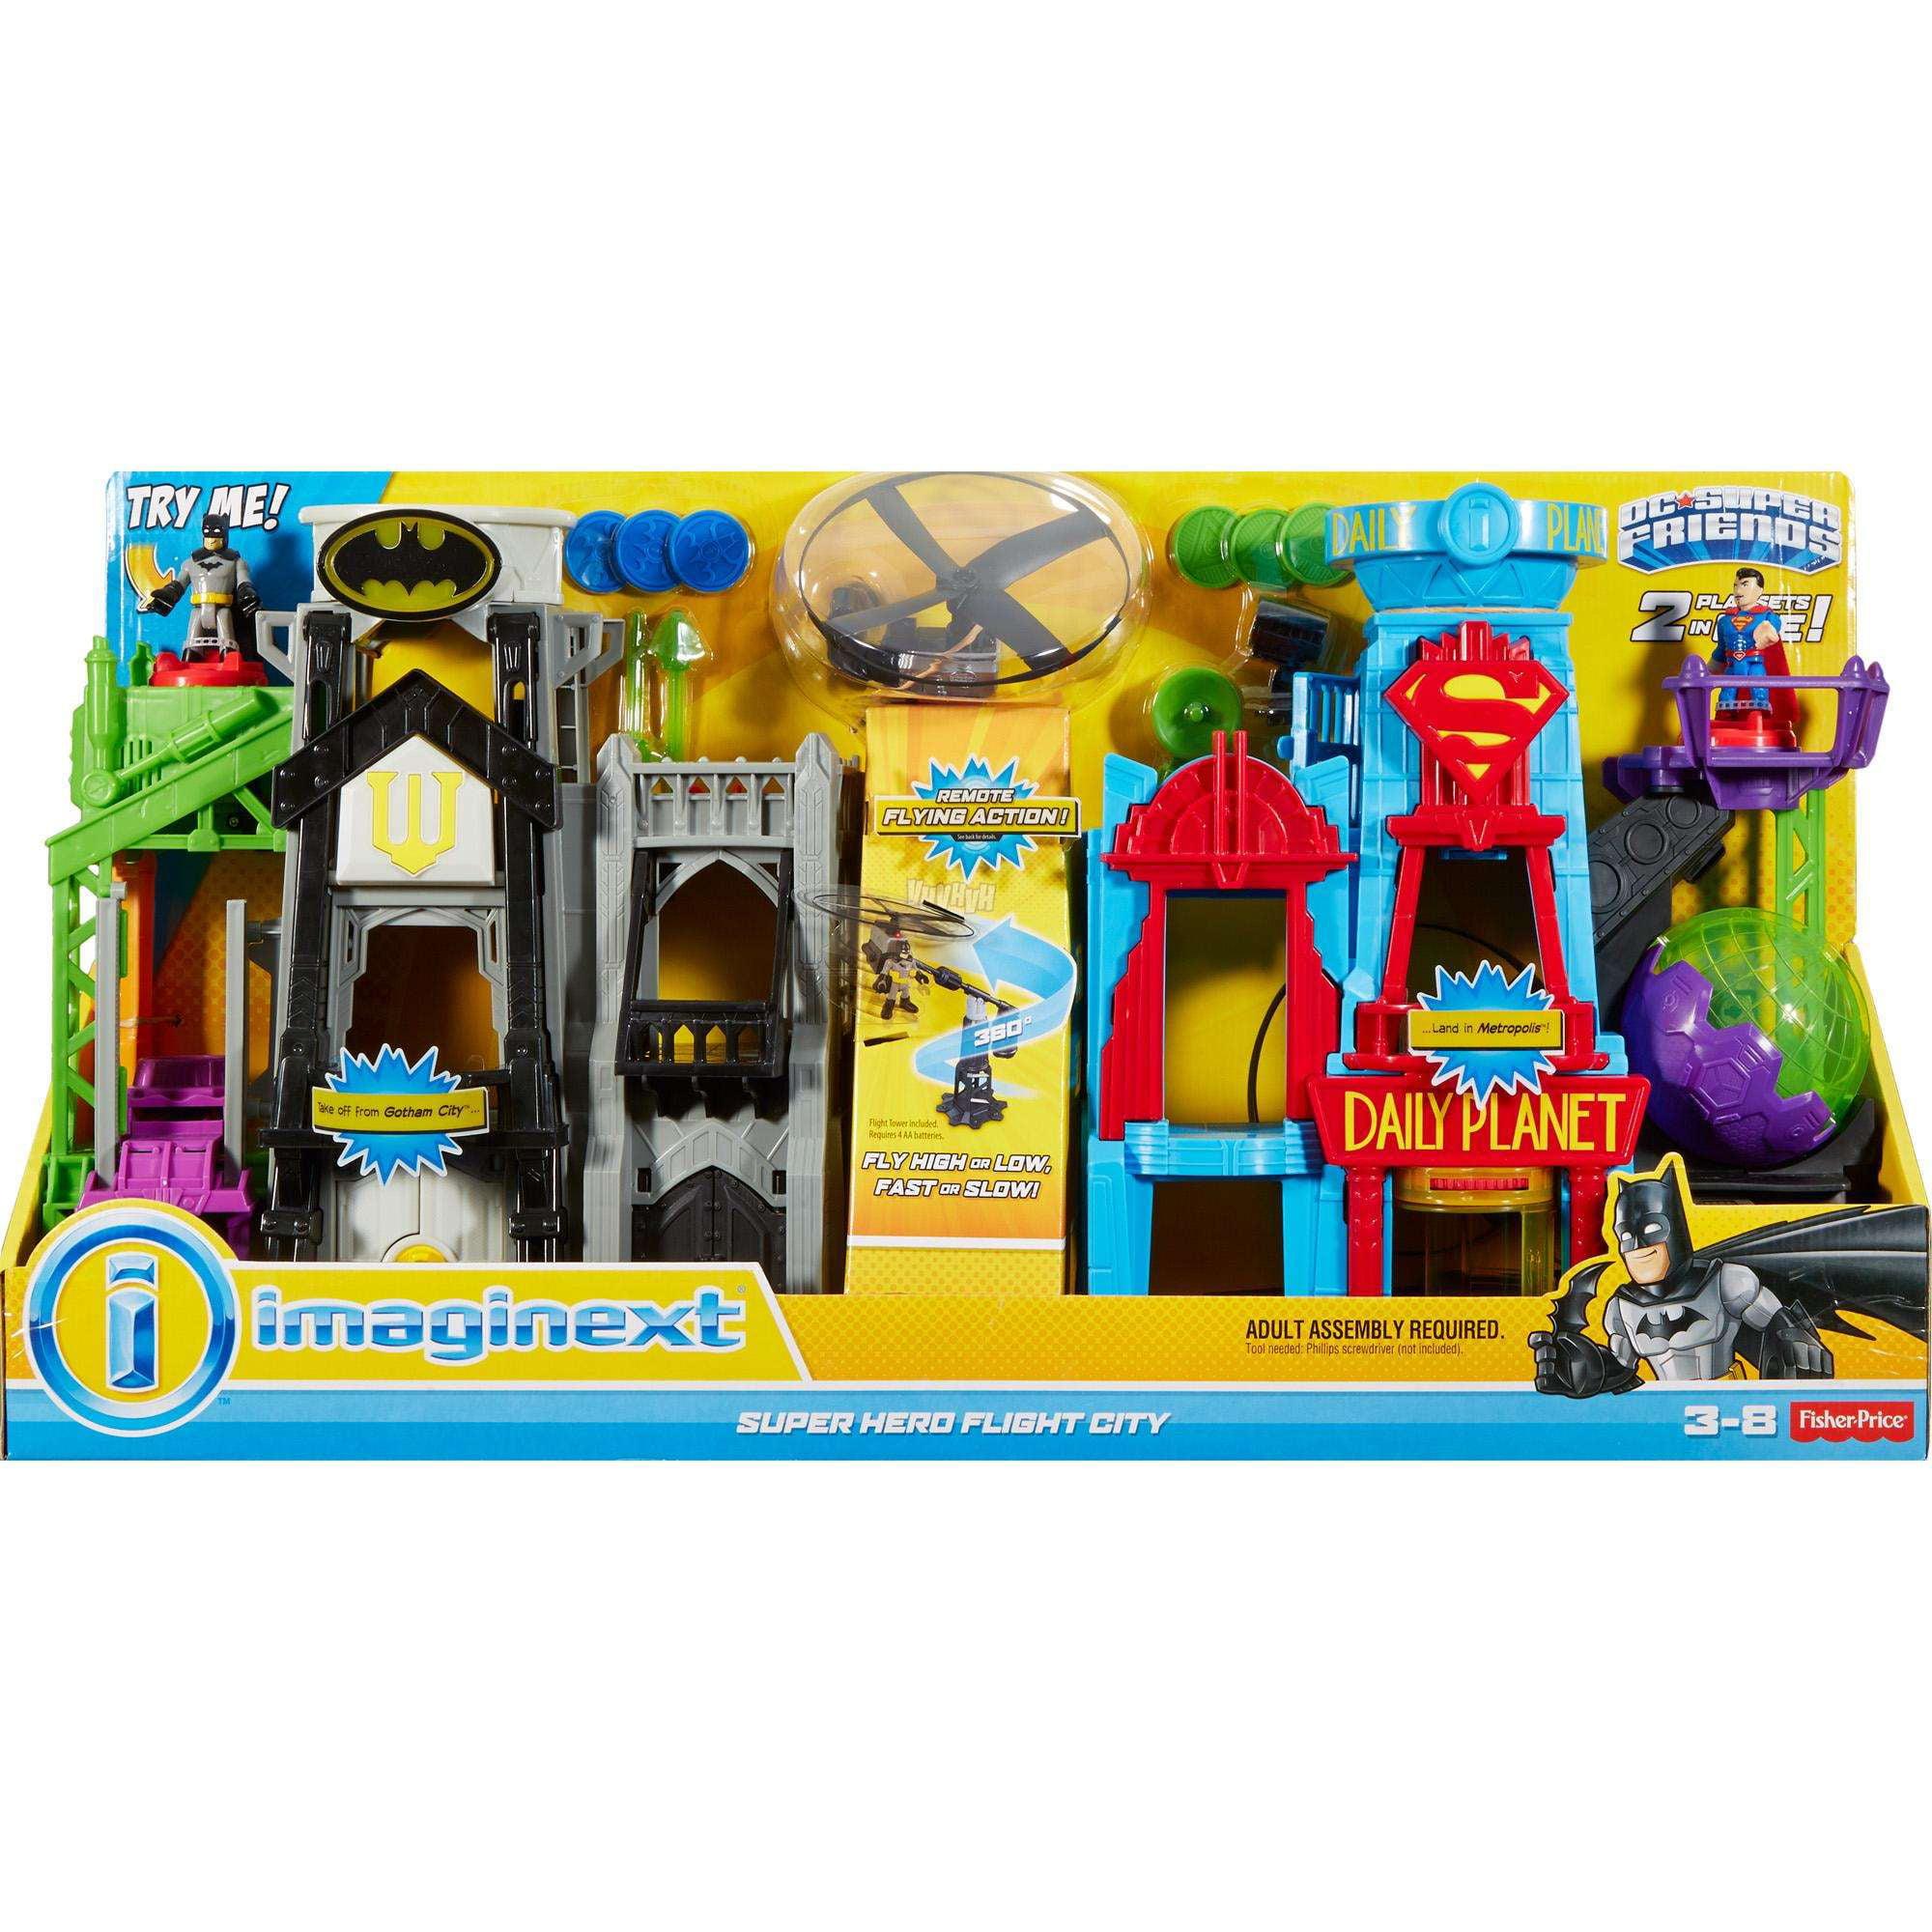 Imaginext DC Super Friends Super Hero Flight City Walmartcom - Superheroes re imagined as if they were sponsored by big brands